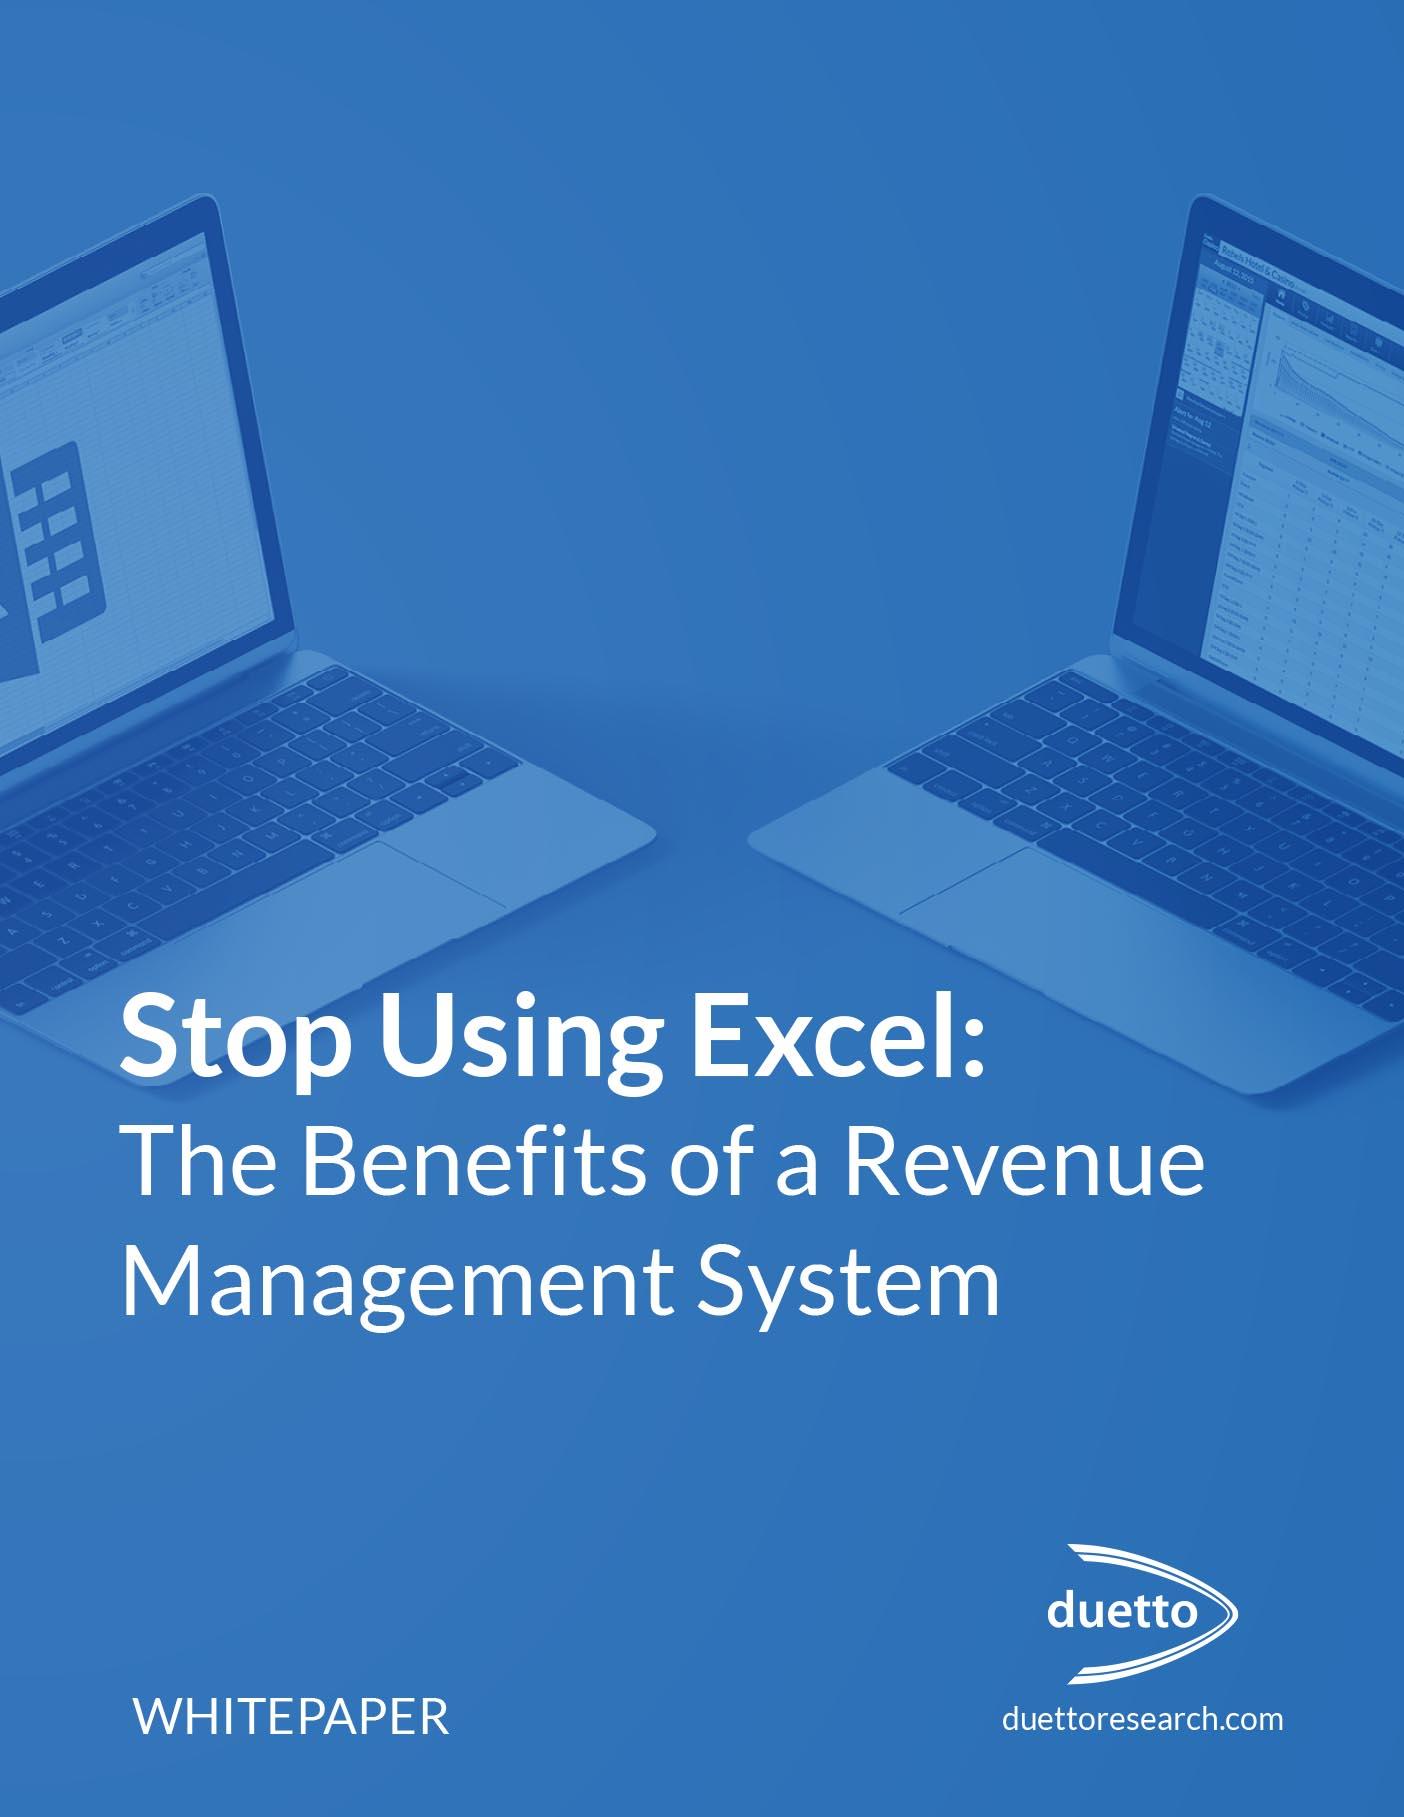 1 Stop-Using-Excel-Benefits-Revenue-Management-System-1.jpg